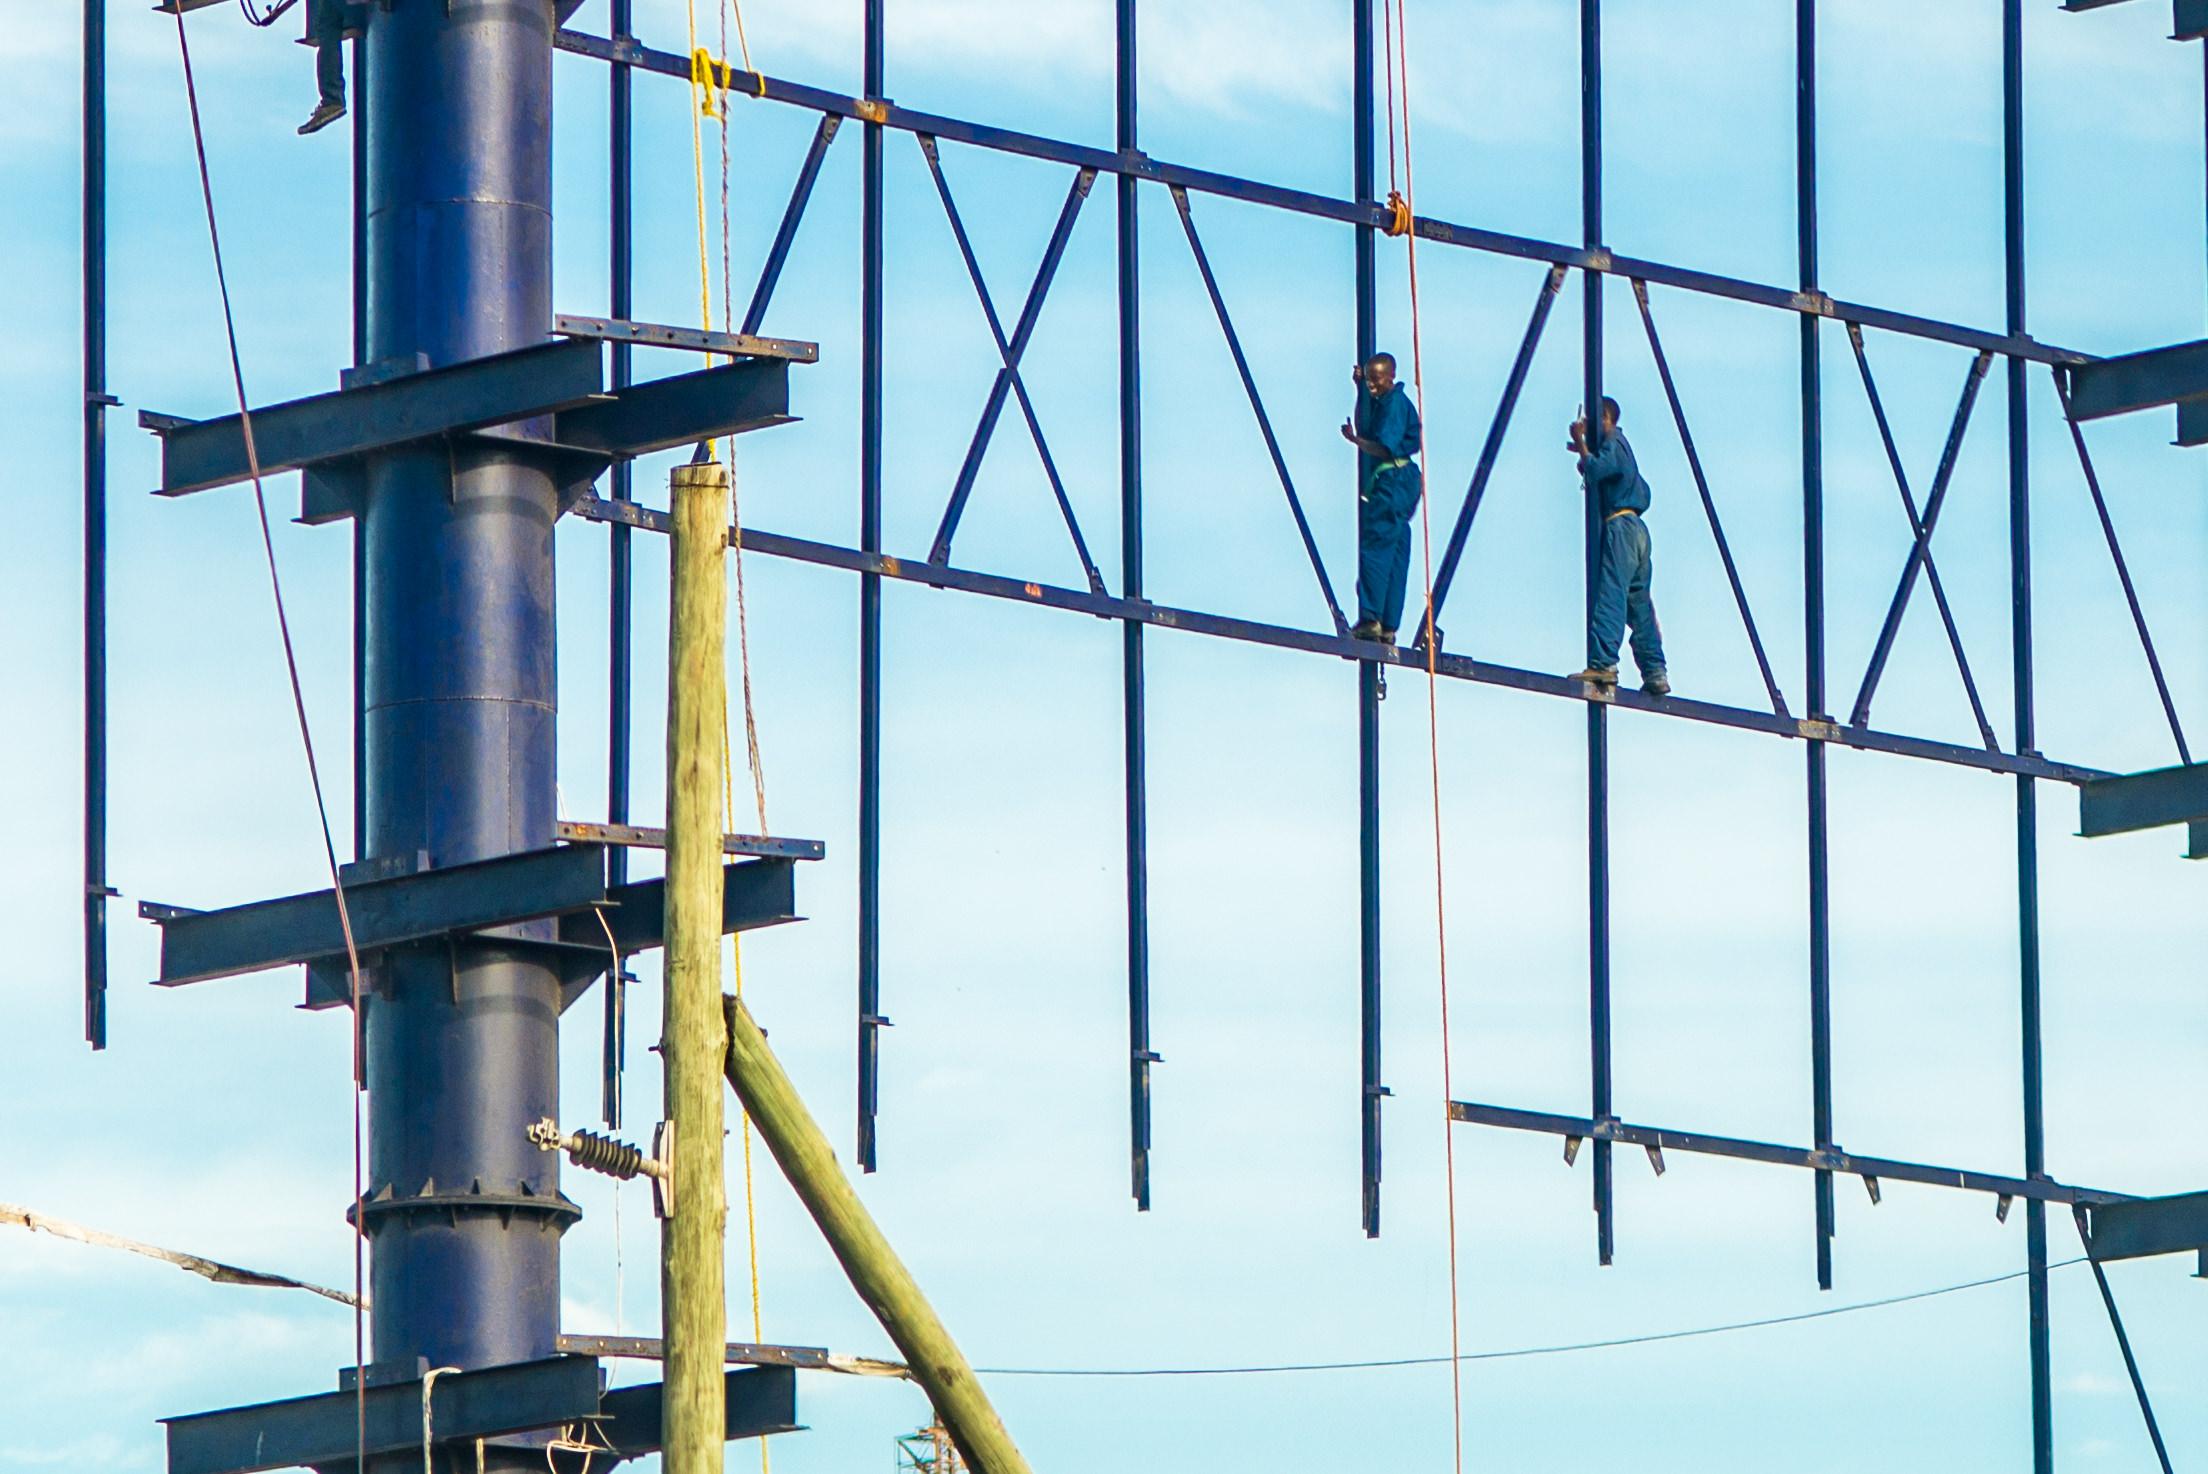 Men working up high on a bilboard